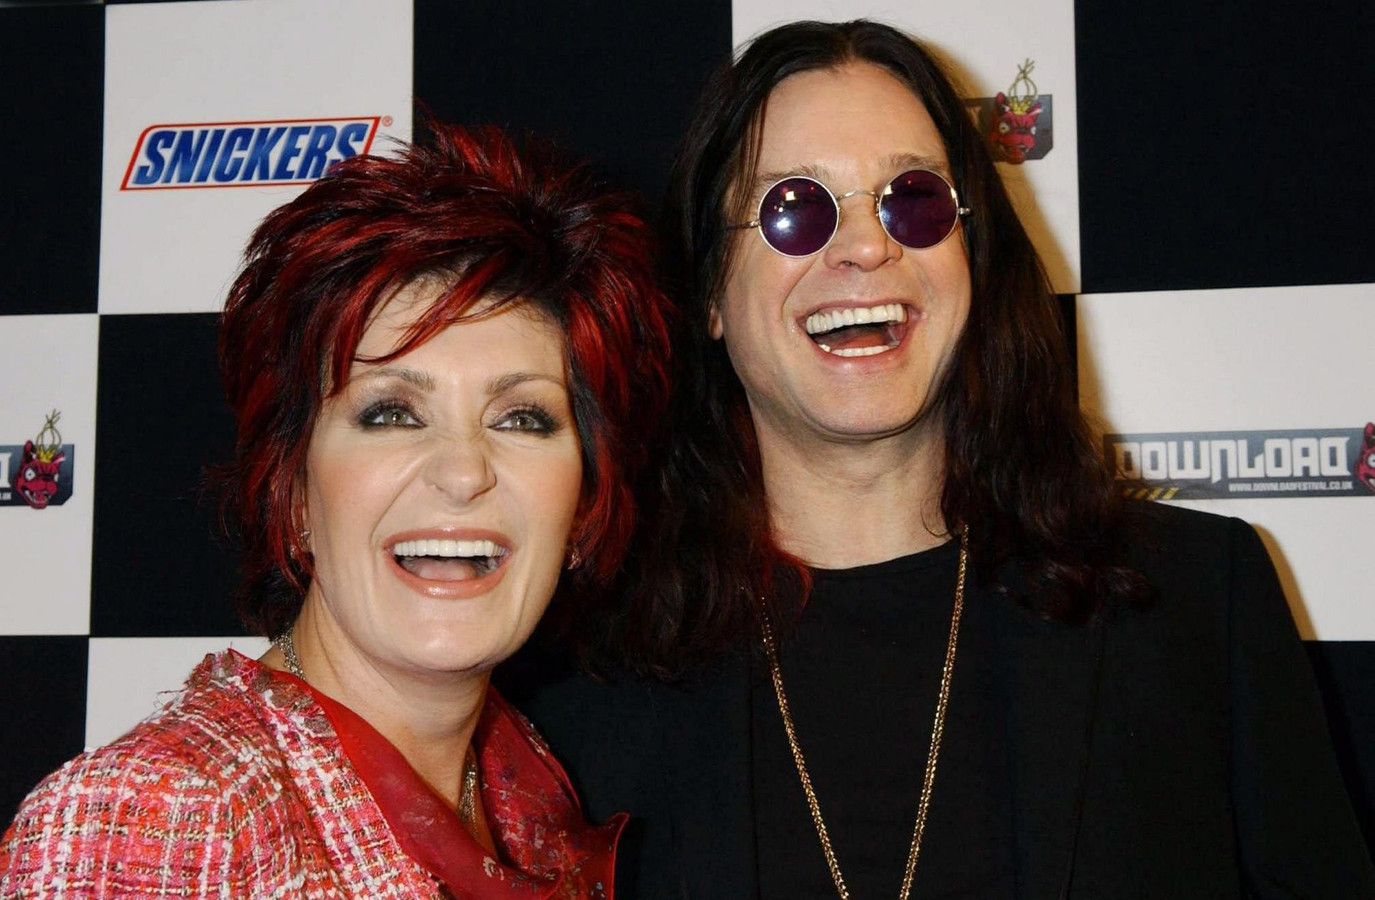 Sharon en Ozzy Osbourne in 2005.